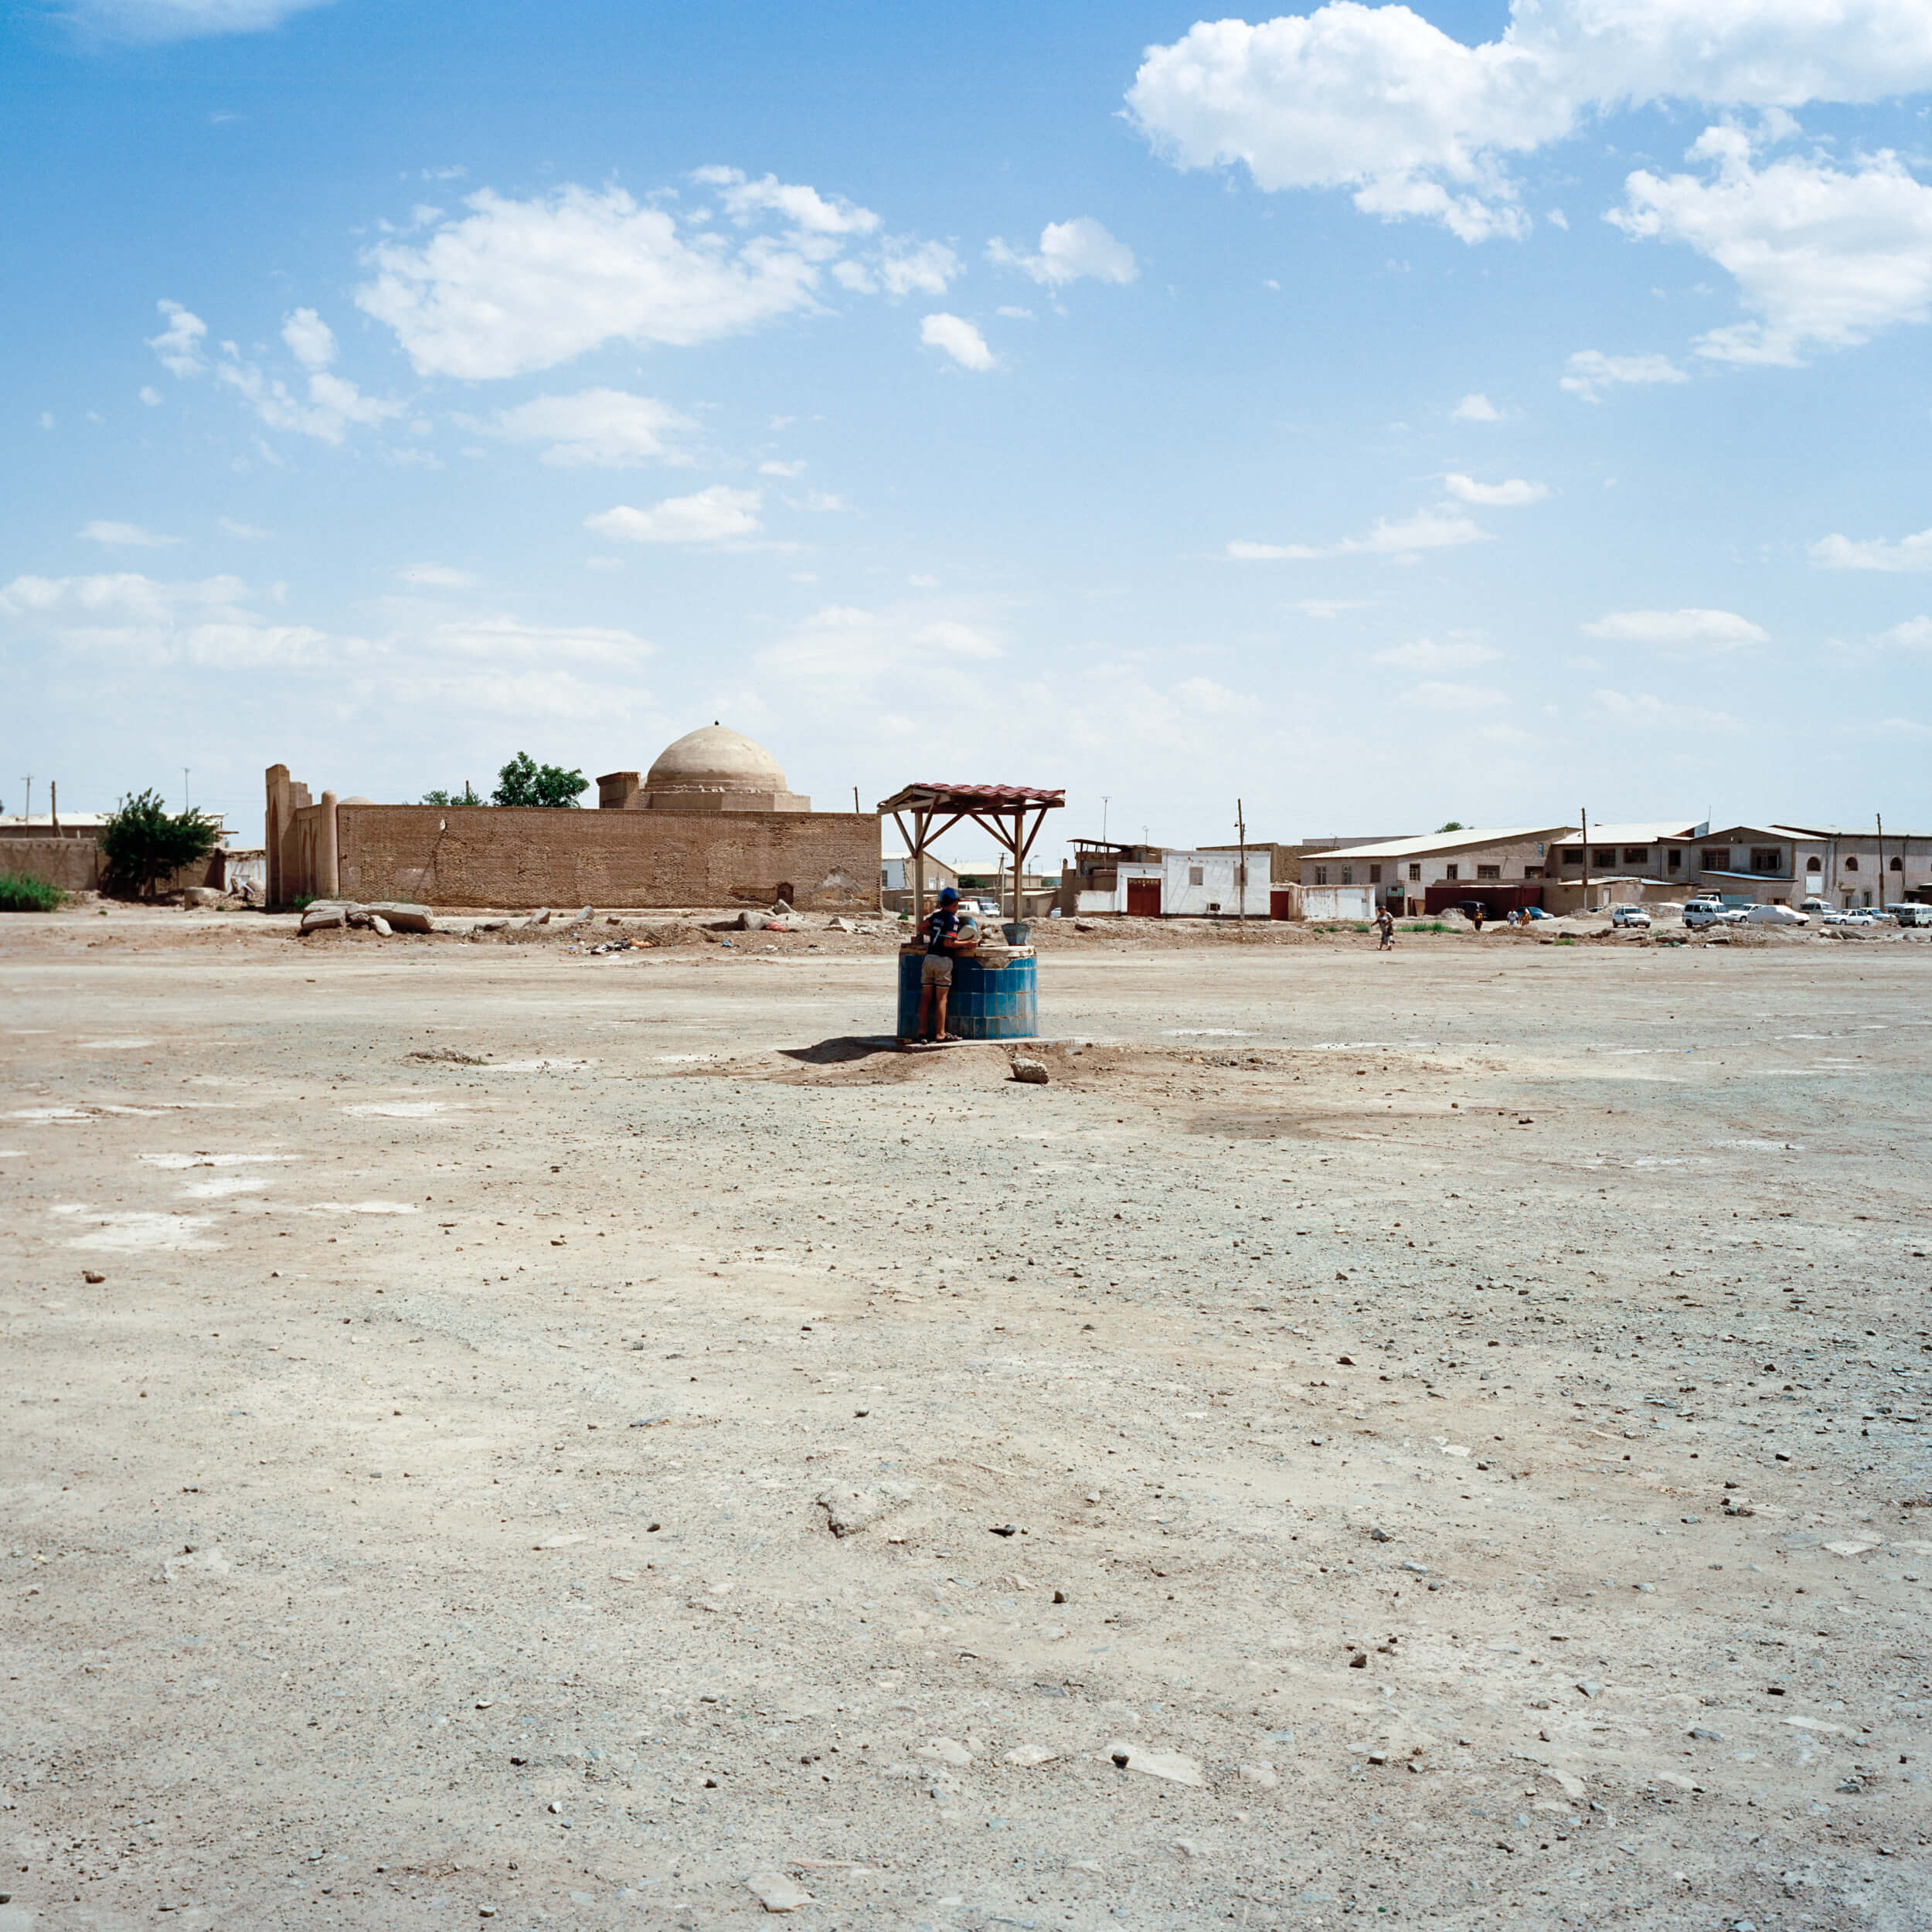 marco-barbieri-water-in-the-desert-31.jpg